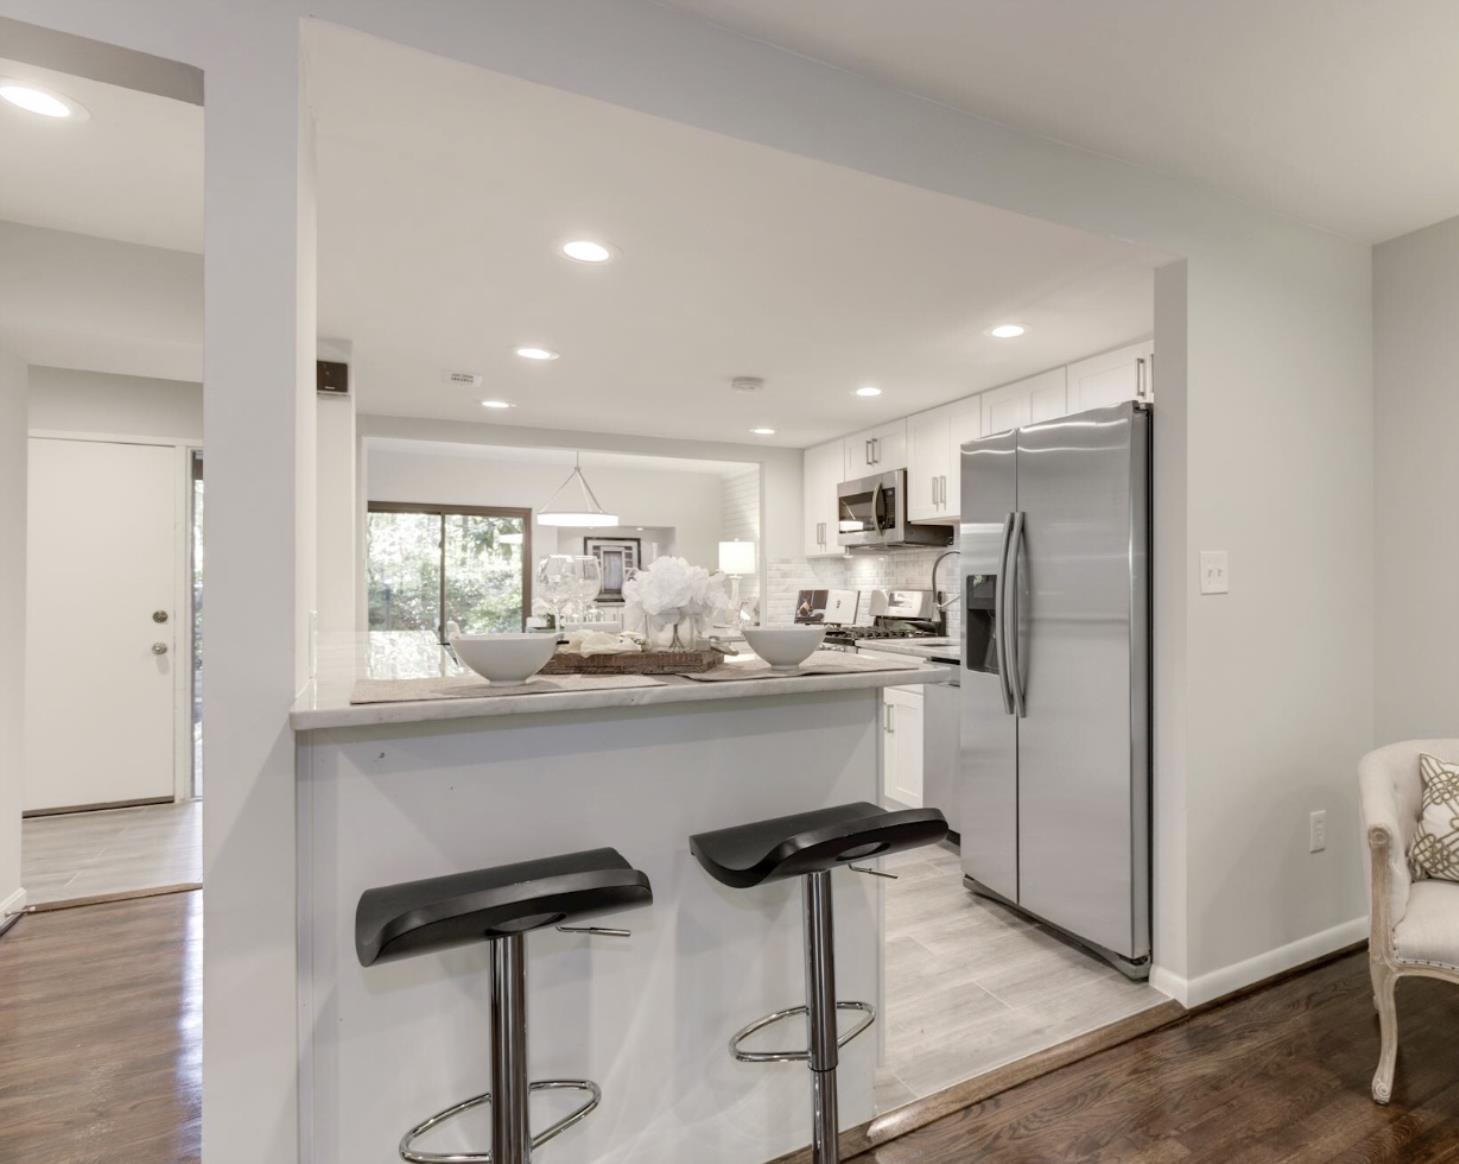 Virginia Home Design image 2